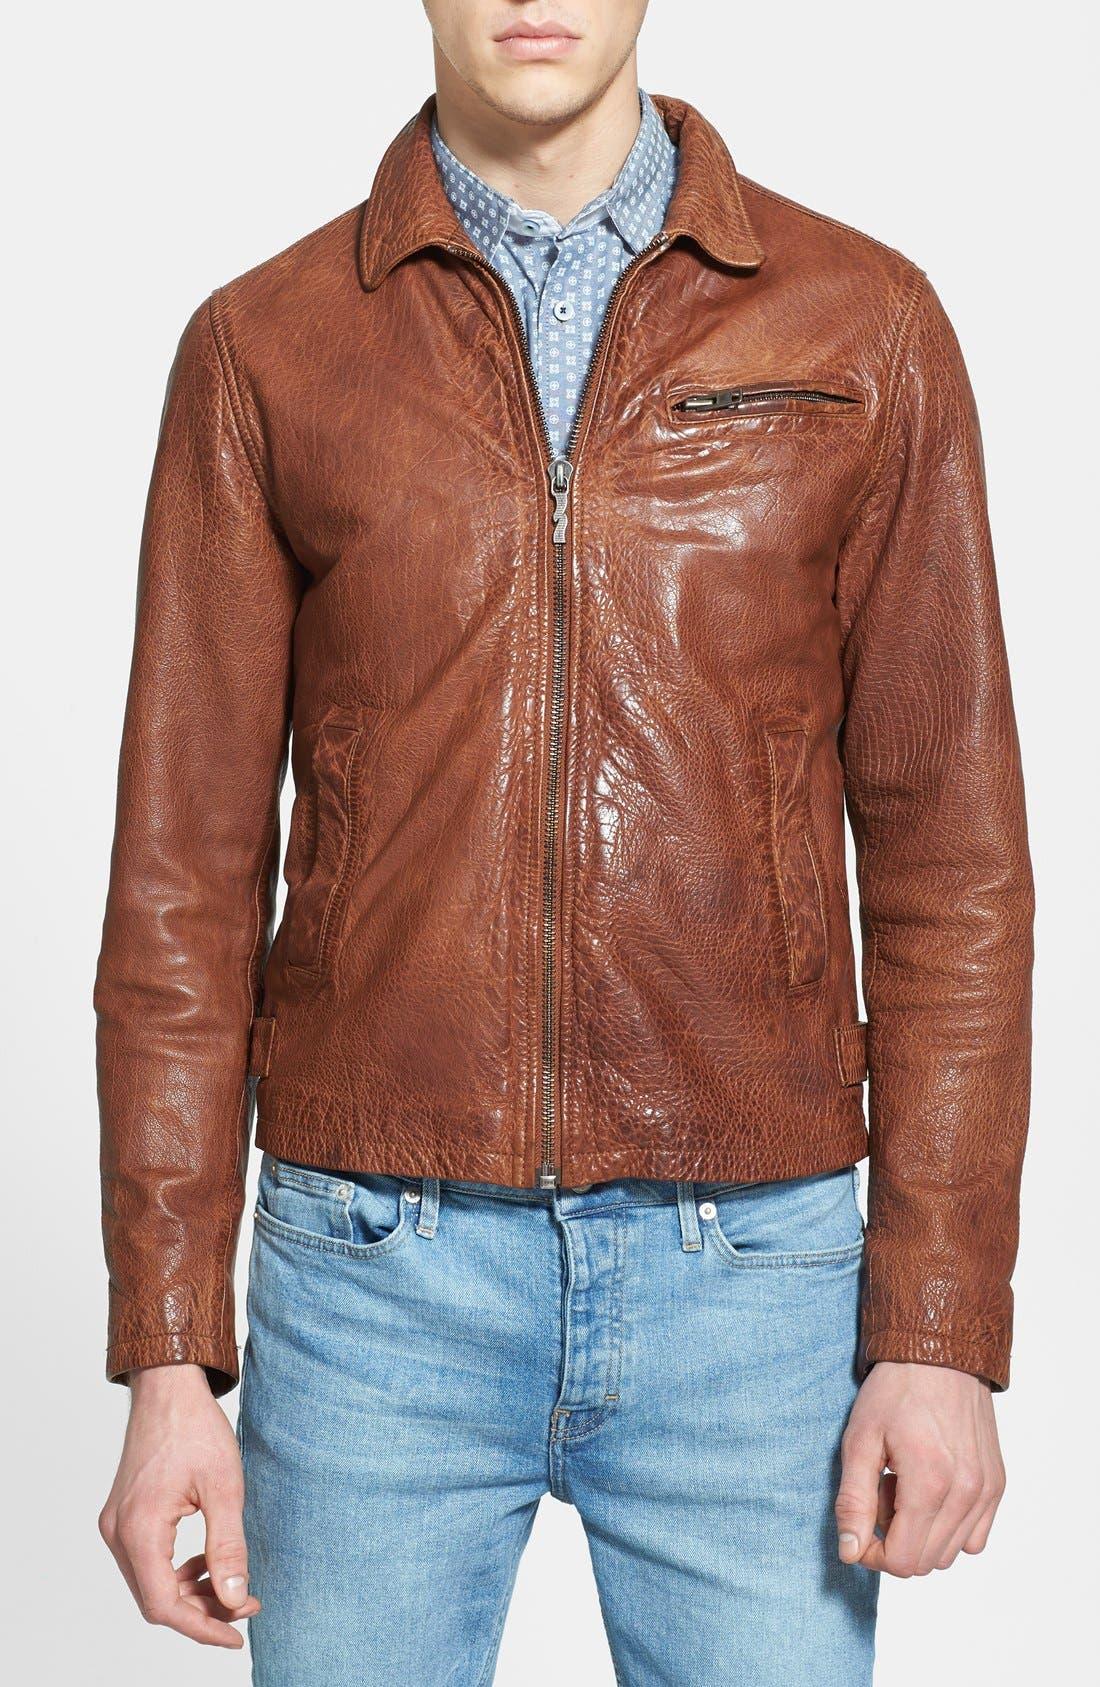 Main Image - Nudie Jeans 'Ervin '50s' Leather Jacket